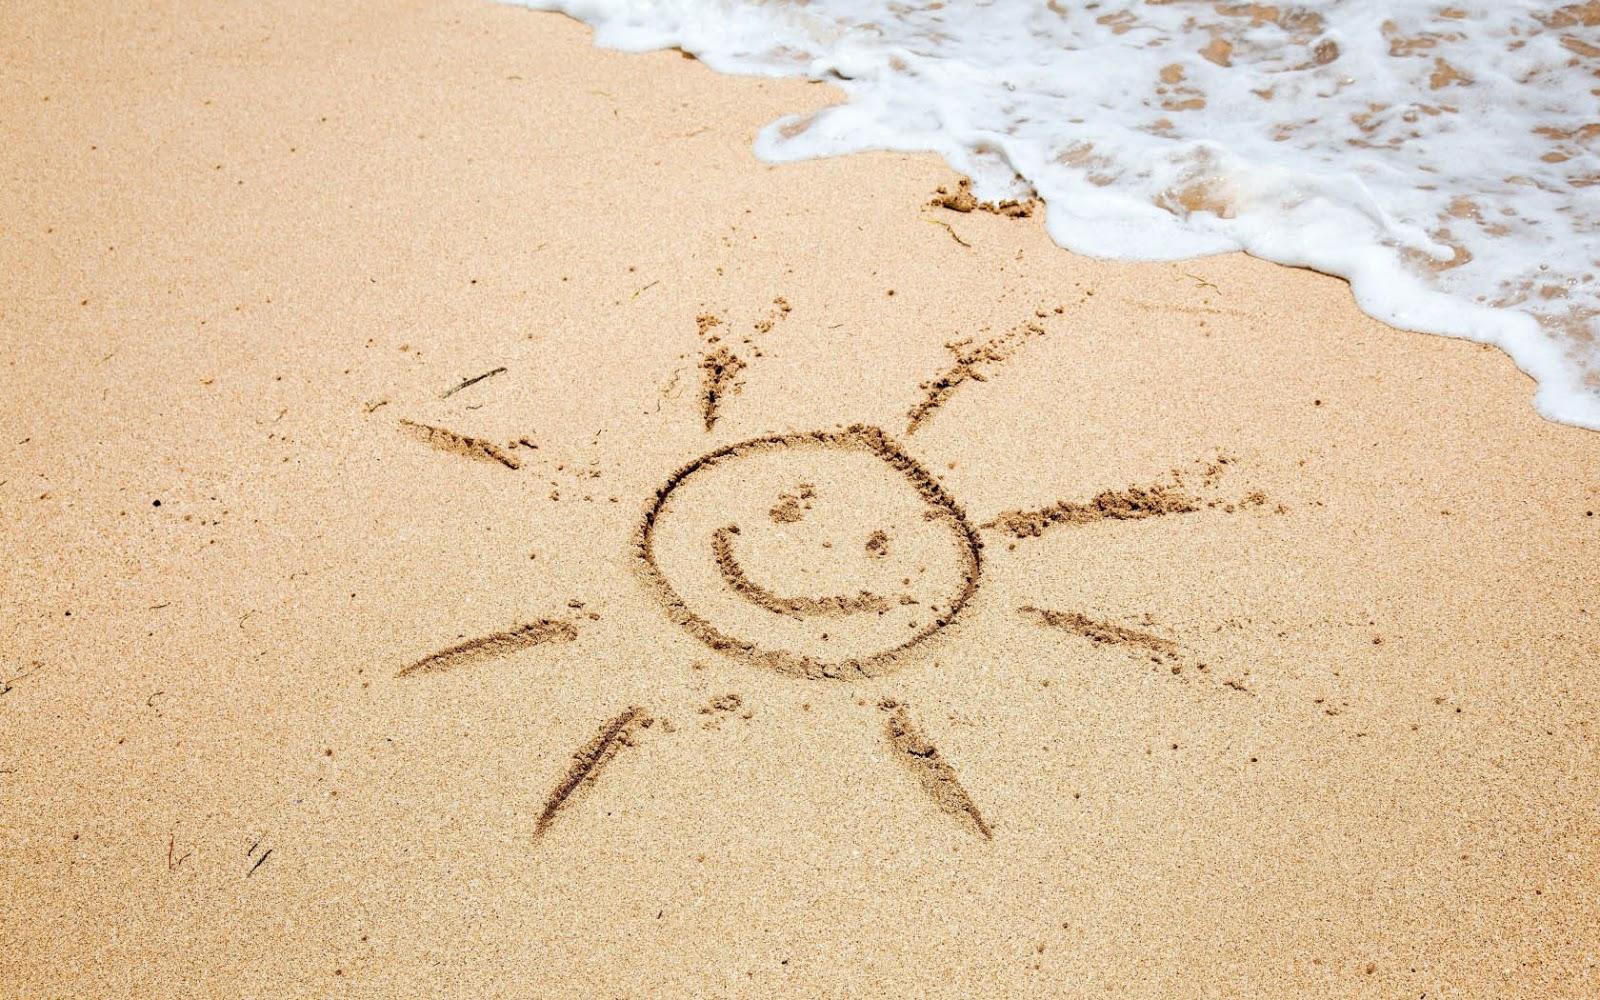 zon-getekend-in-zand